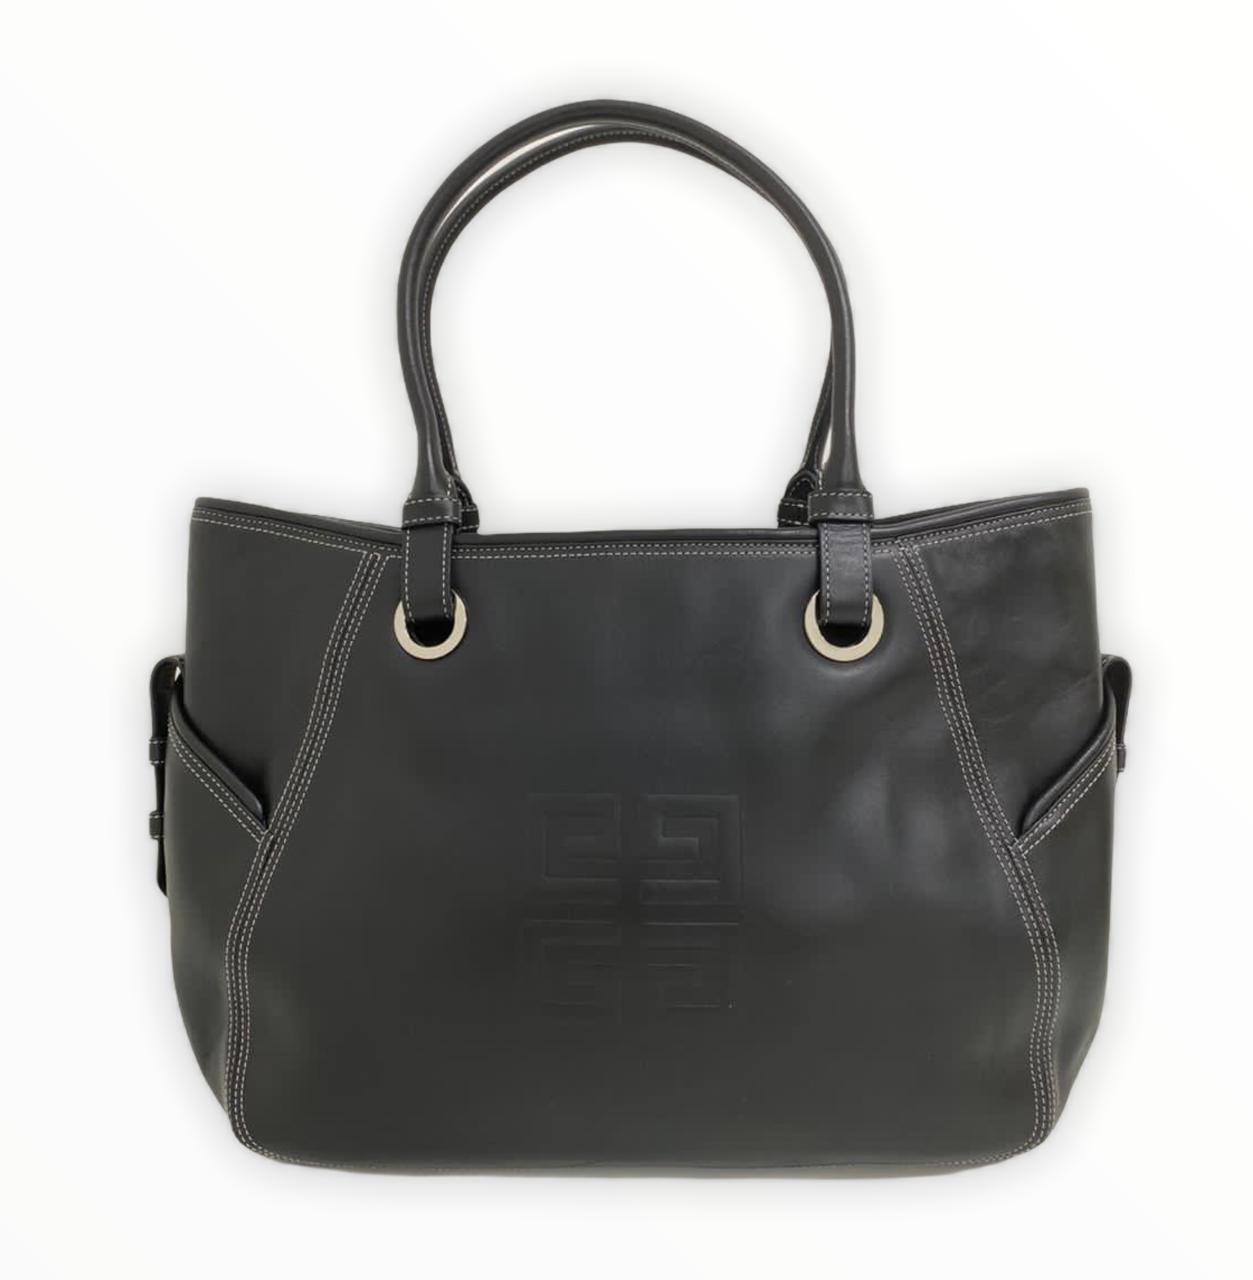 Bolsa Givenchy Preta Tote